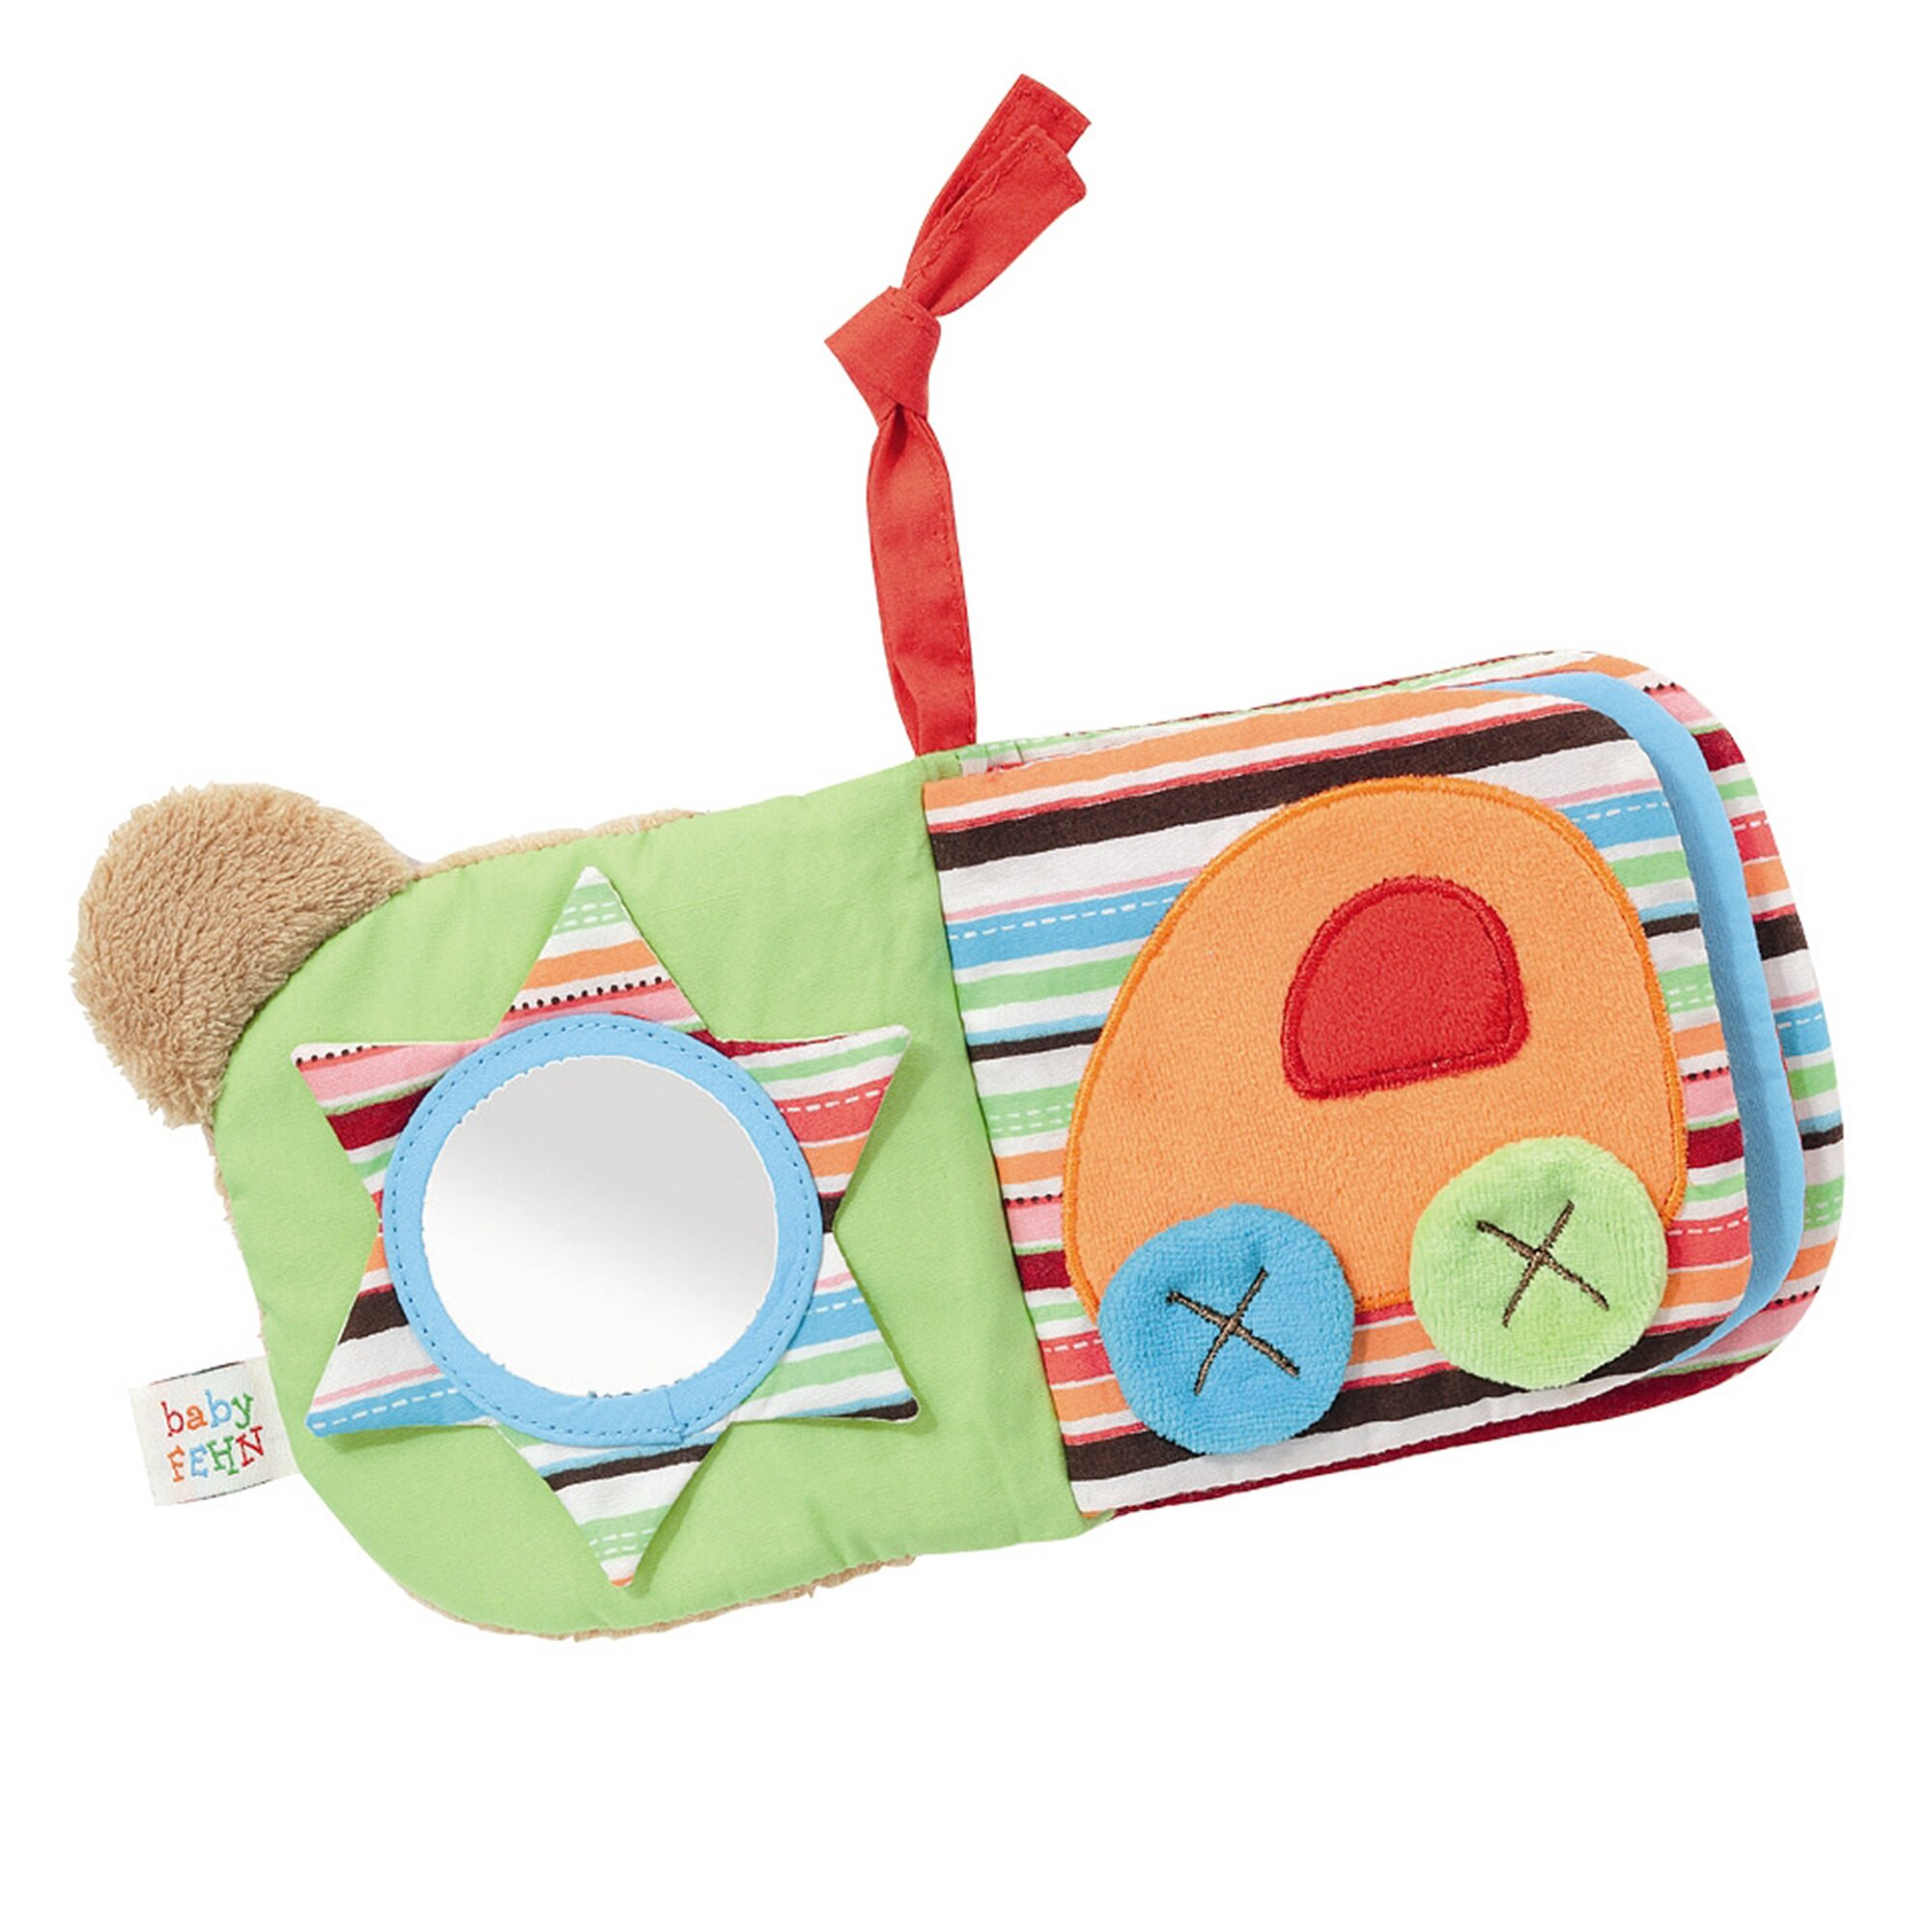 fehn-babys-erstes-soft-bilderbuch-teddy